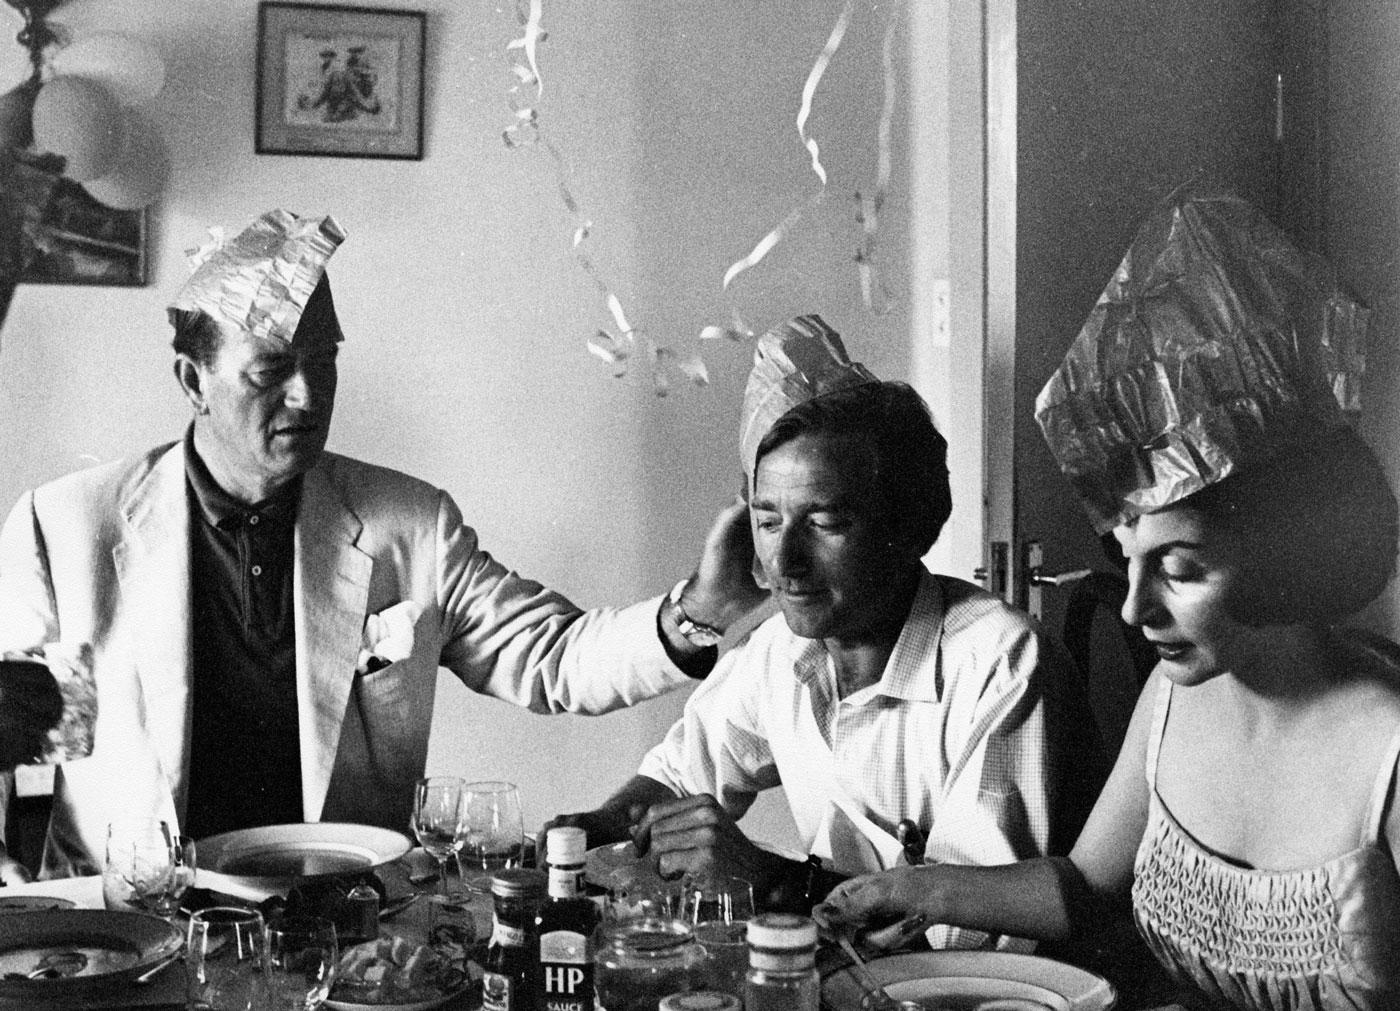 John Wayne and Pilar Wayne enjoying a celebratory dinner with friends in Africa. Photo courtesy of John Wayne Enterprises